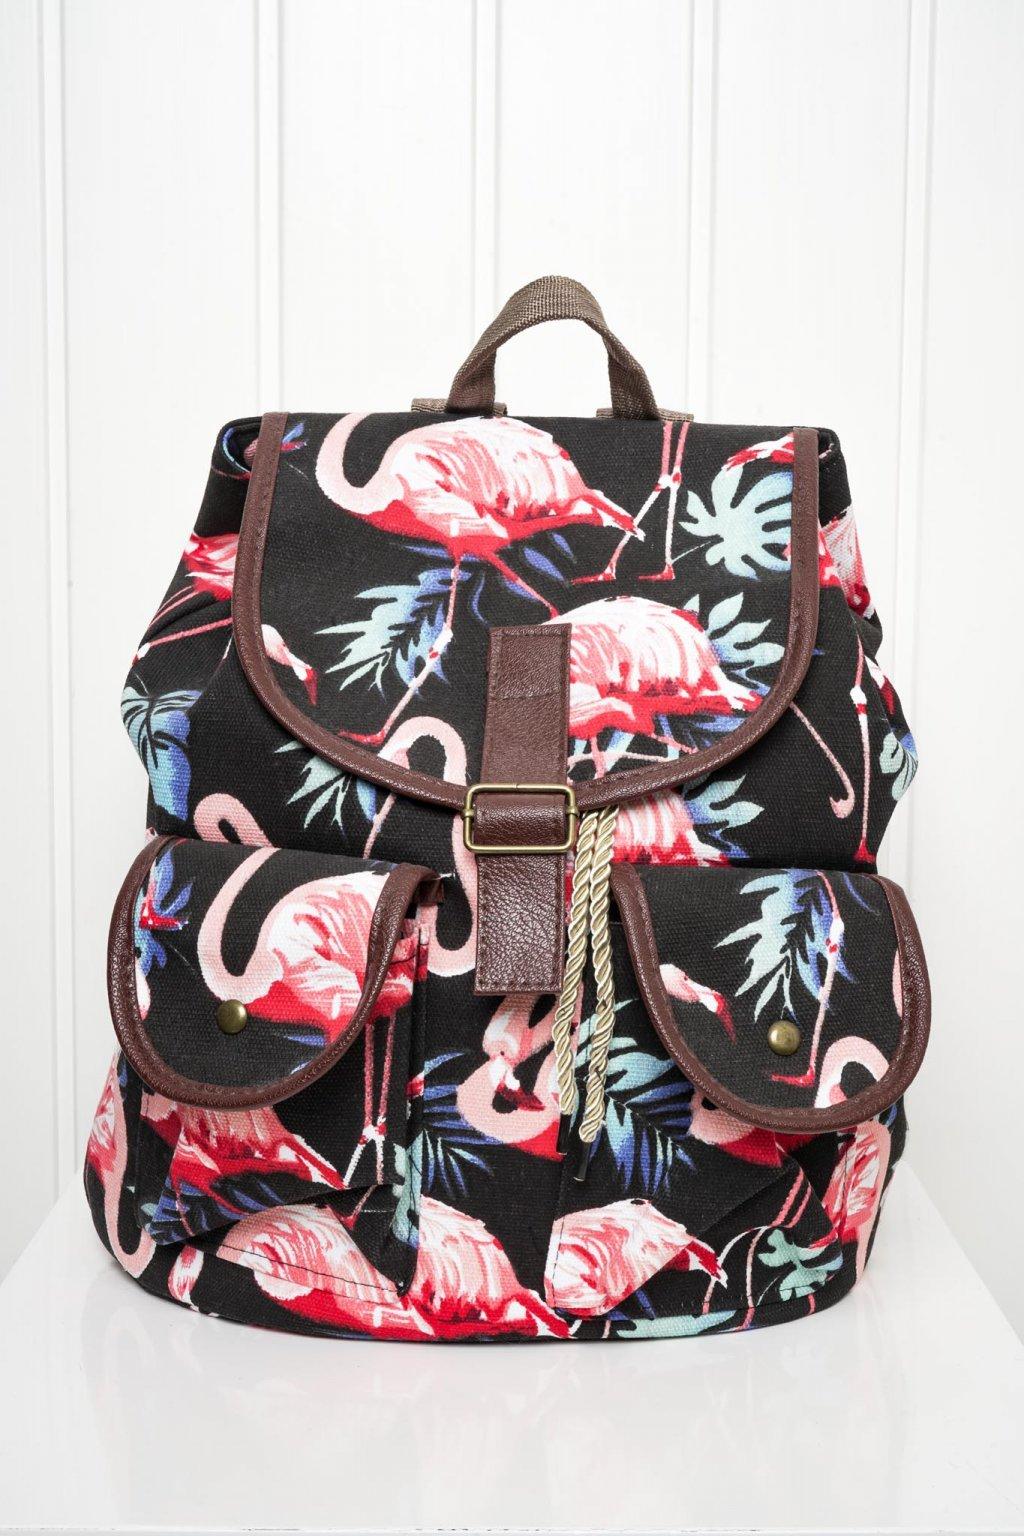 Kabelka, crossbody, ruksak, shopping bag, shopperka, 373